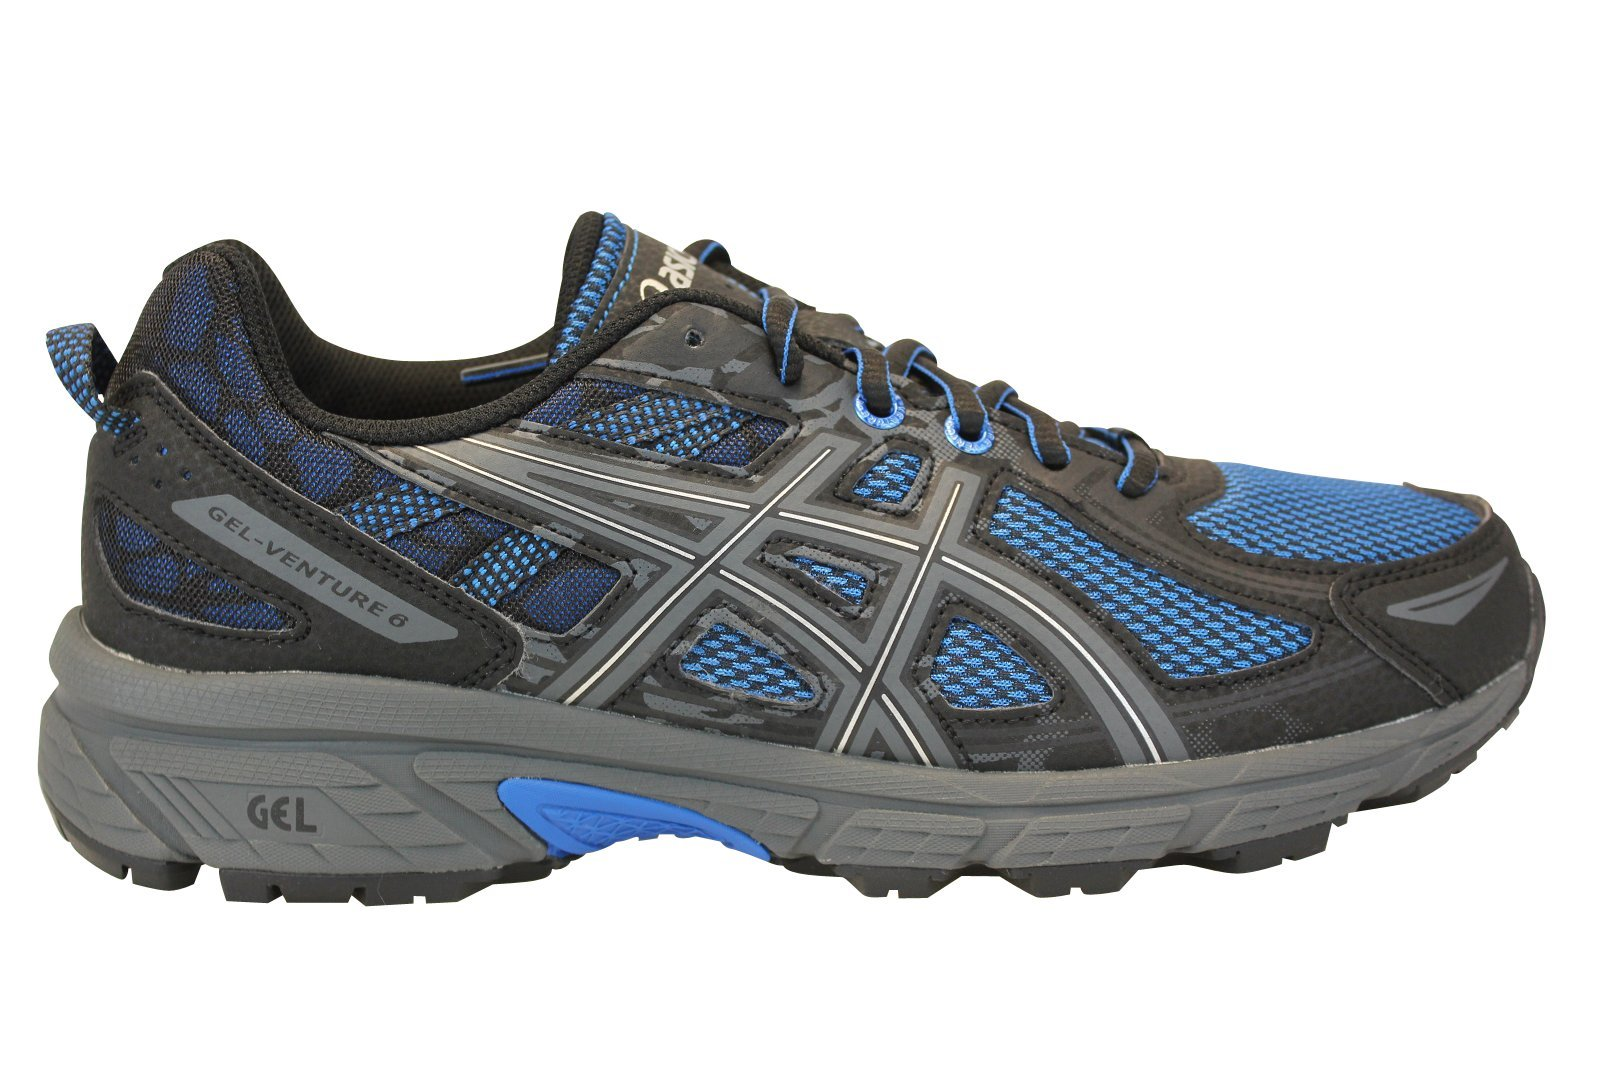 ASICS Gel-Venture 6 Mens Running Trainers T7G1N Sneakers Shoes (UK 7.5 US 8.5 EU 42, Victoria Blue Black 4545)